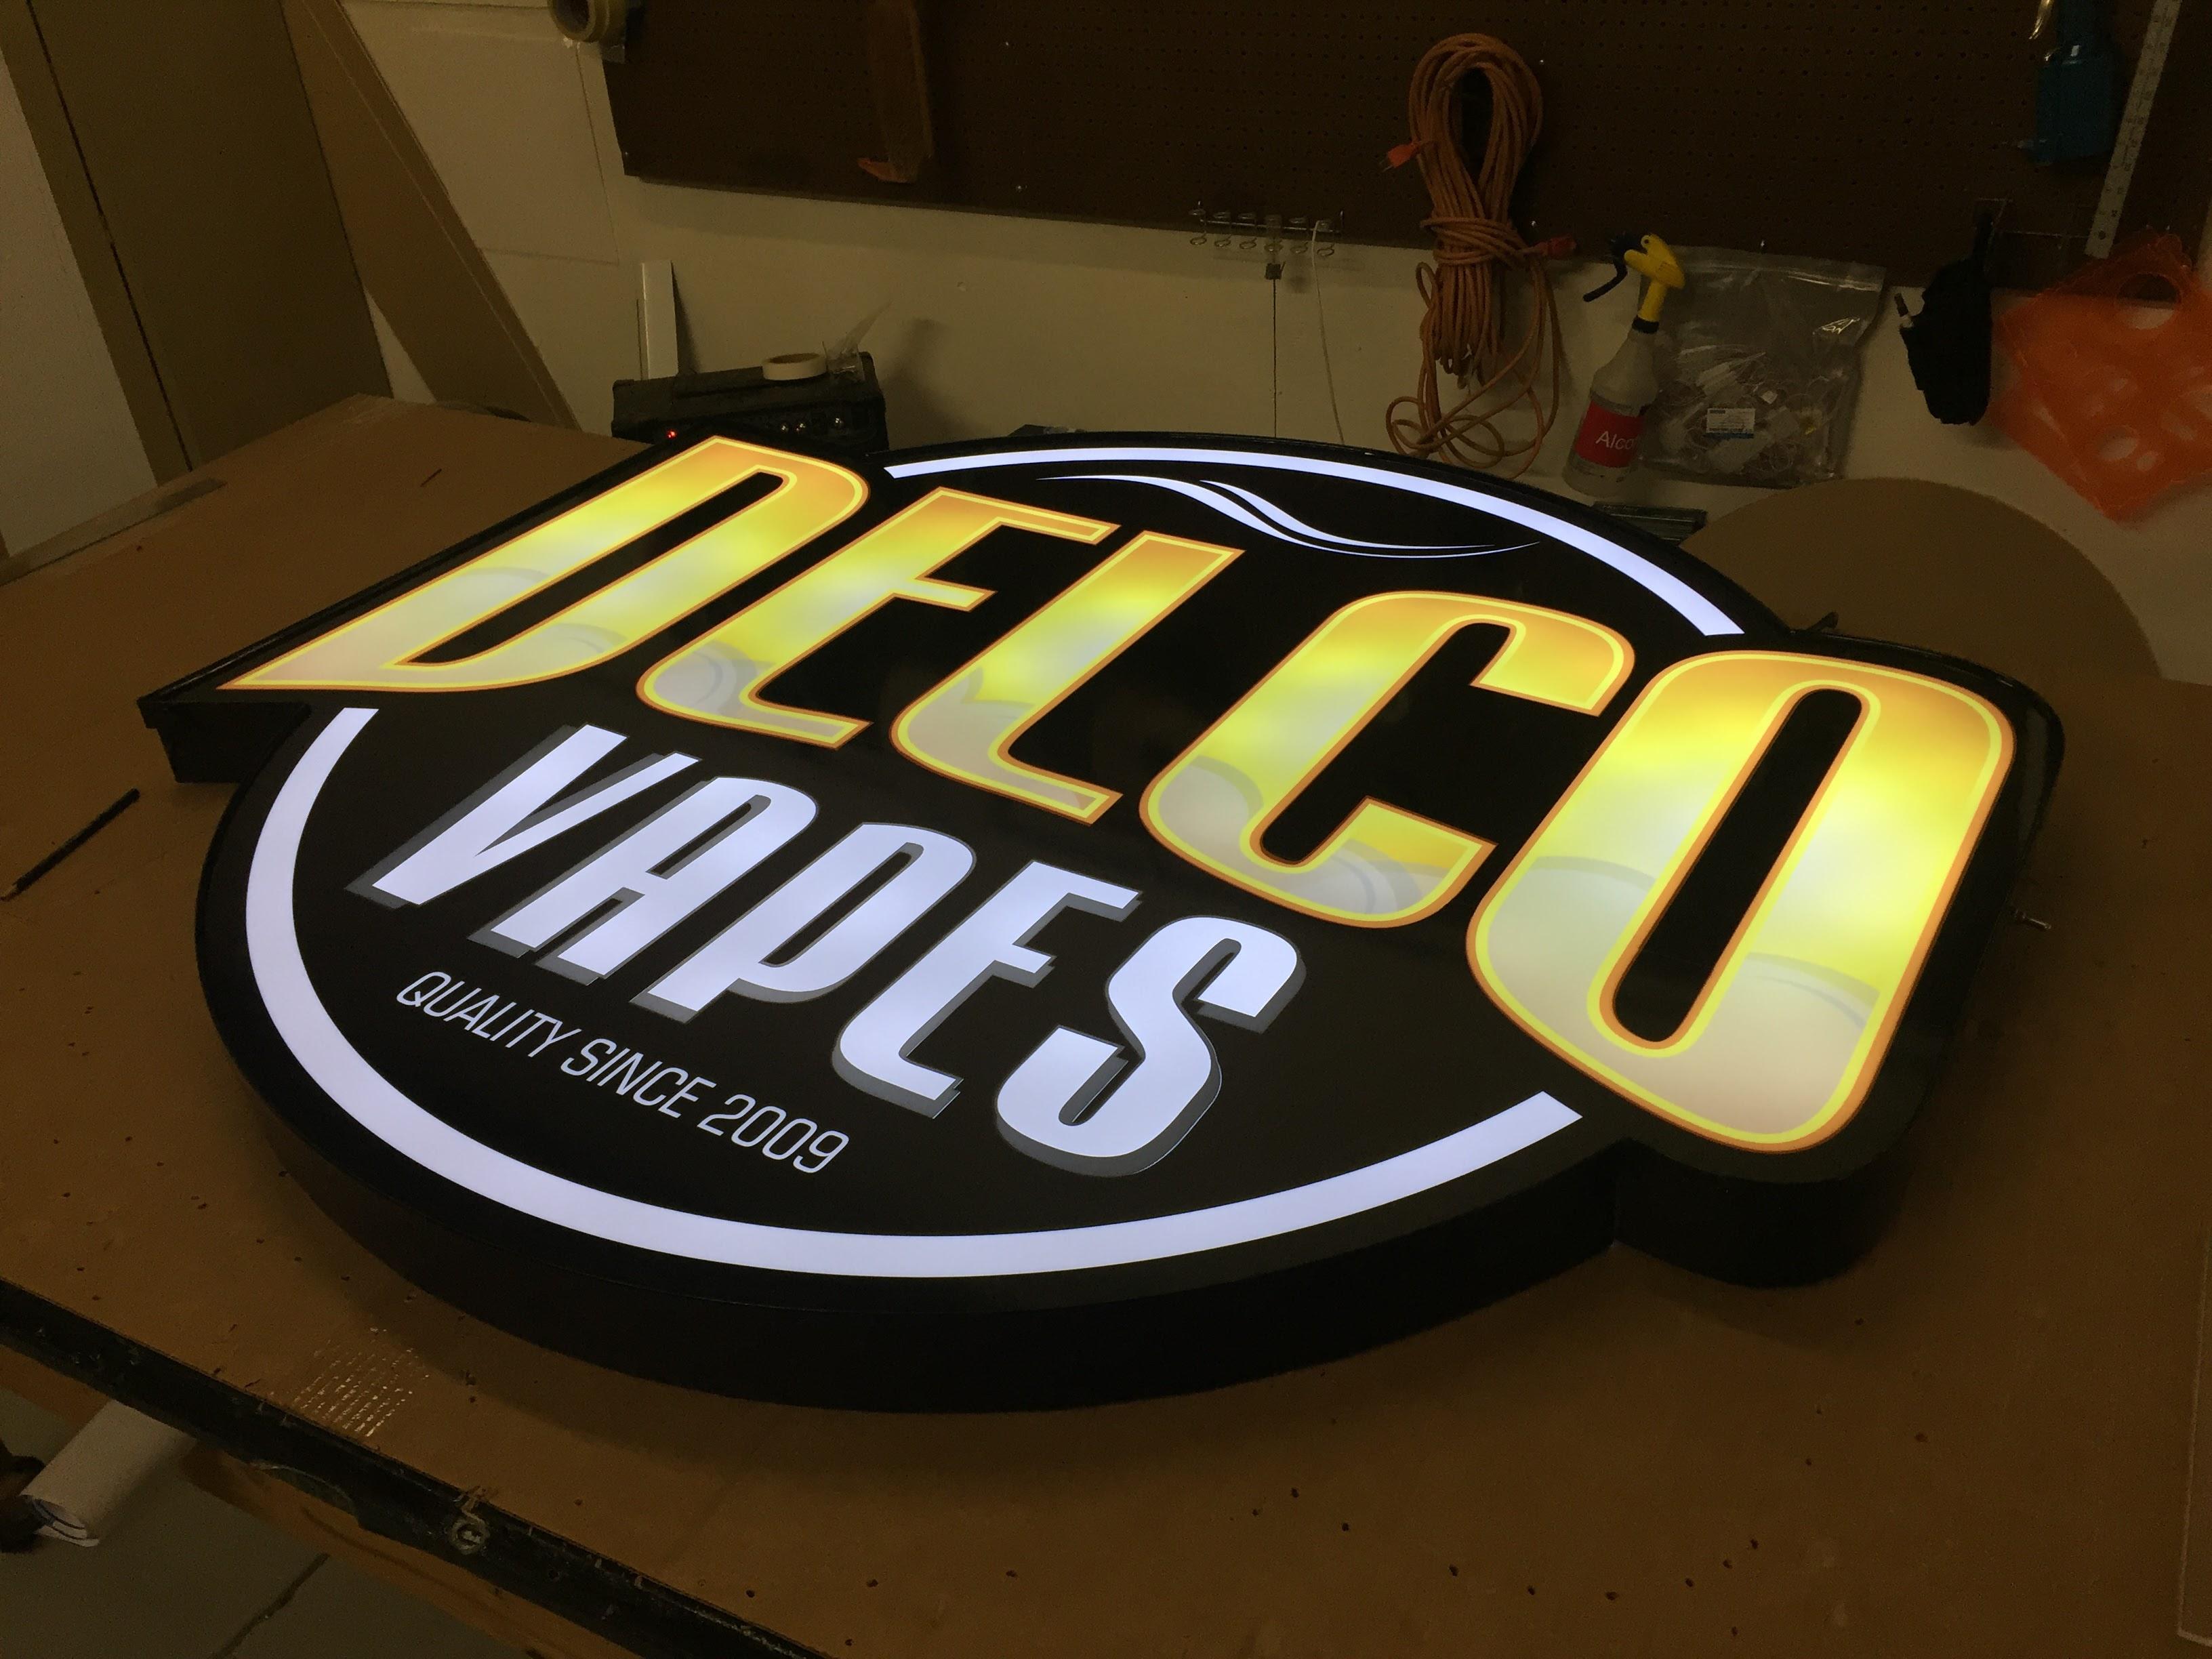 LED Lit Interior Sign